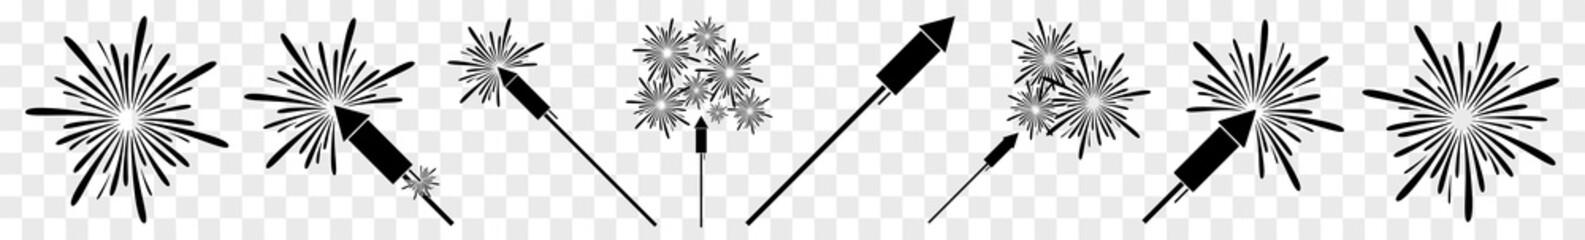 Fireworks Icon Black | Firecracker | New Year Symbol | Pyrotechnics Logo | Firework Rocket Sign | Isolated Transparent | Variations